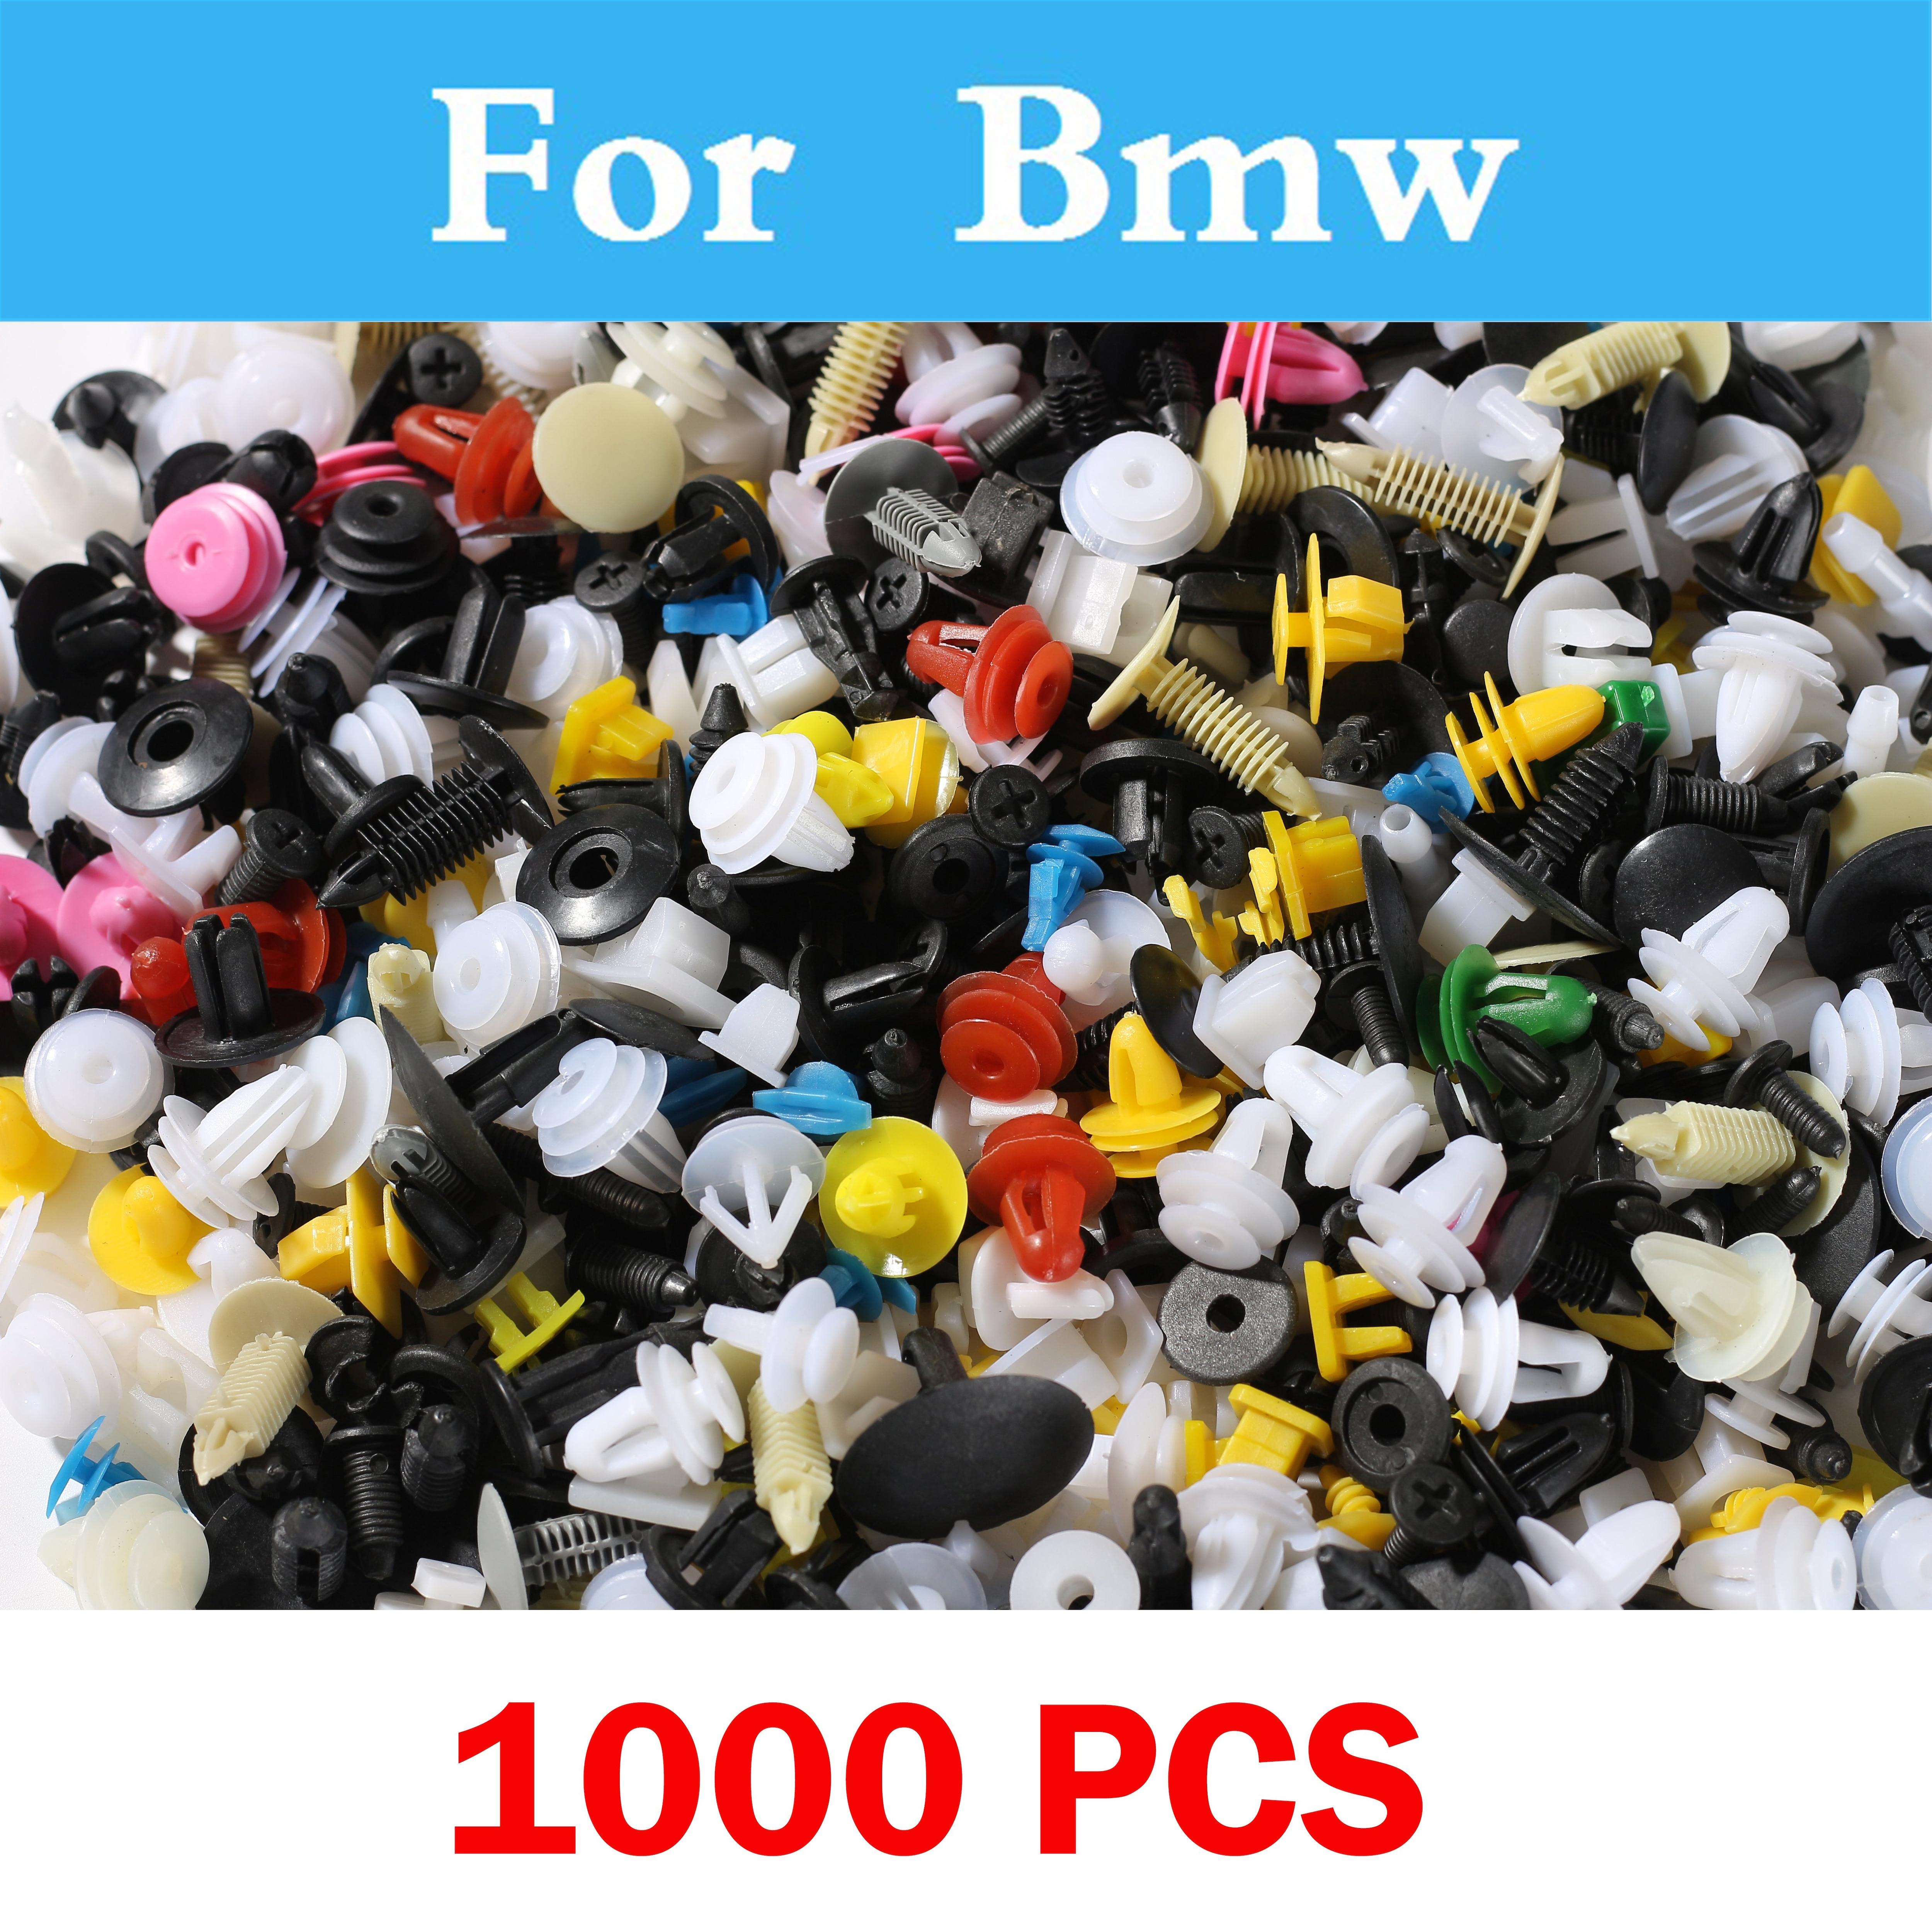 1000pcs Car Plastic Push Type Rivet Retainer Fastener For Bmw E53 E60 E61 E39 E46 E52 E63 E90 F30 F10 X3 X5 X6 M 125i E36 E38 5 speed 6 speed mt car gear shift knob shifter lever stick for bmw z3 z4 x3 x5 e39 e46 e53 e60 e61 e63